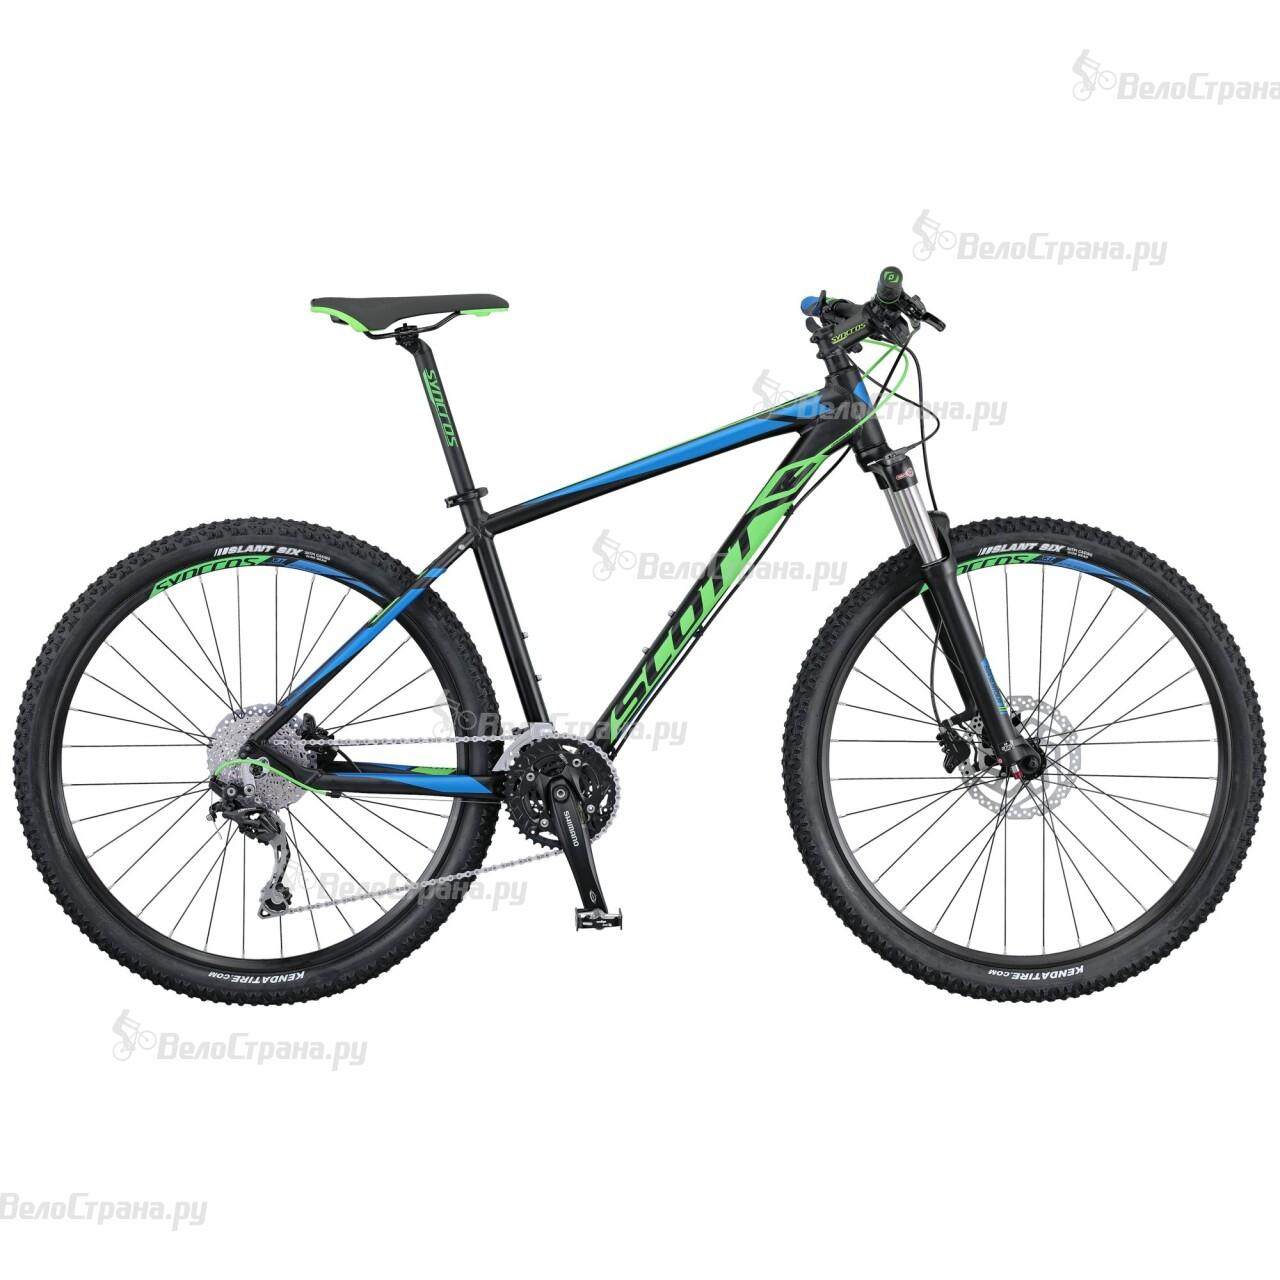 Велосипед Scott Aspect 920 (2016)